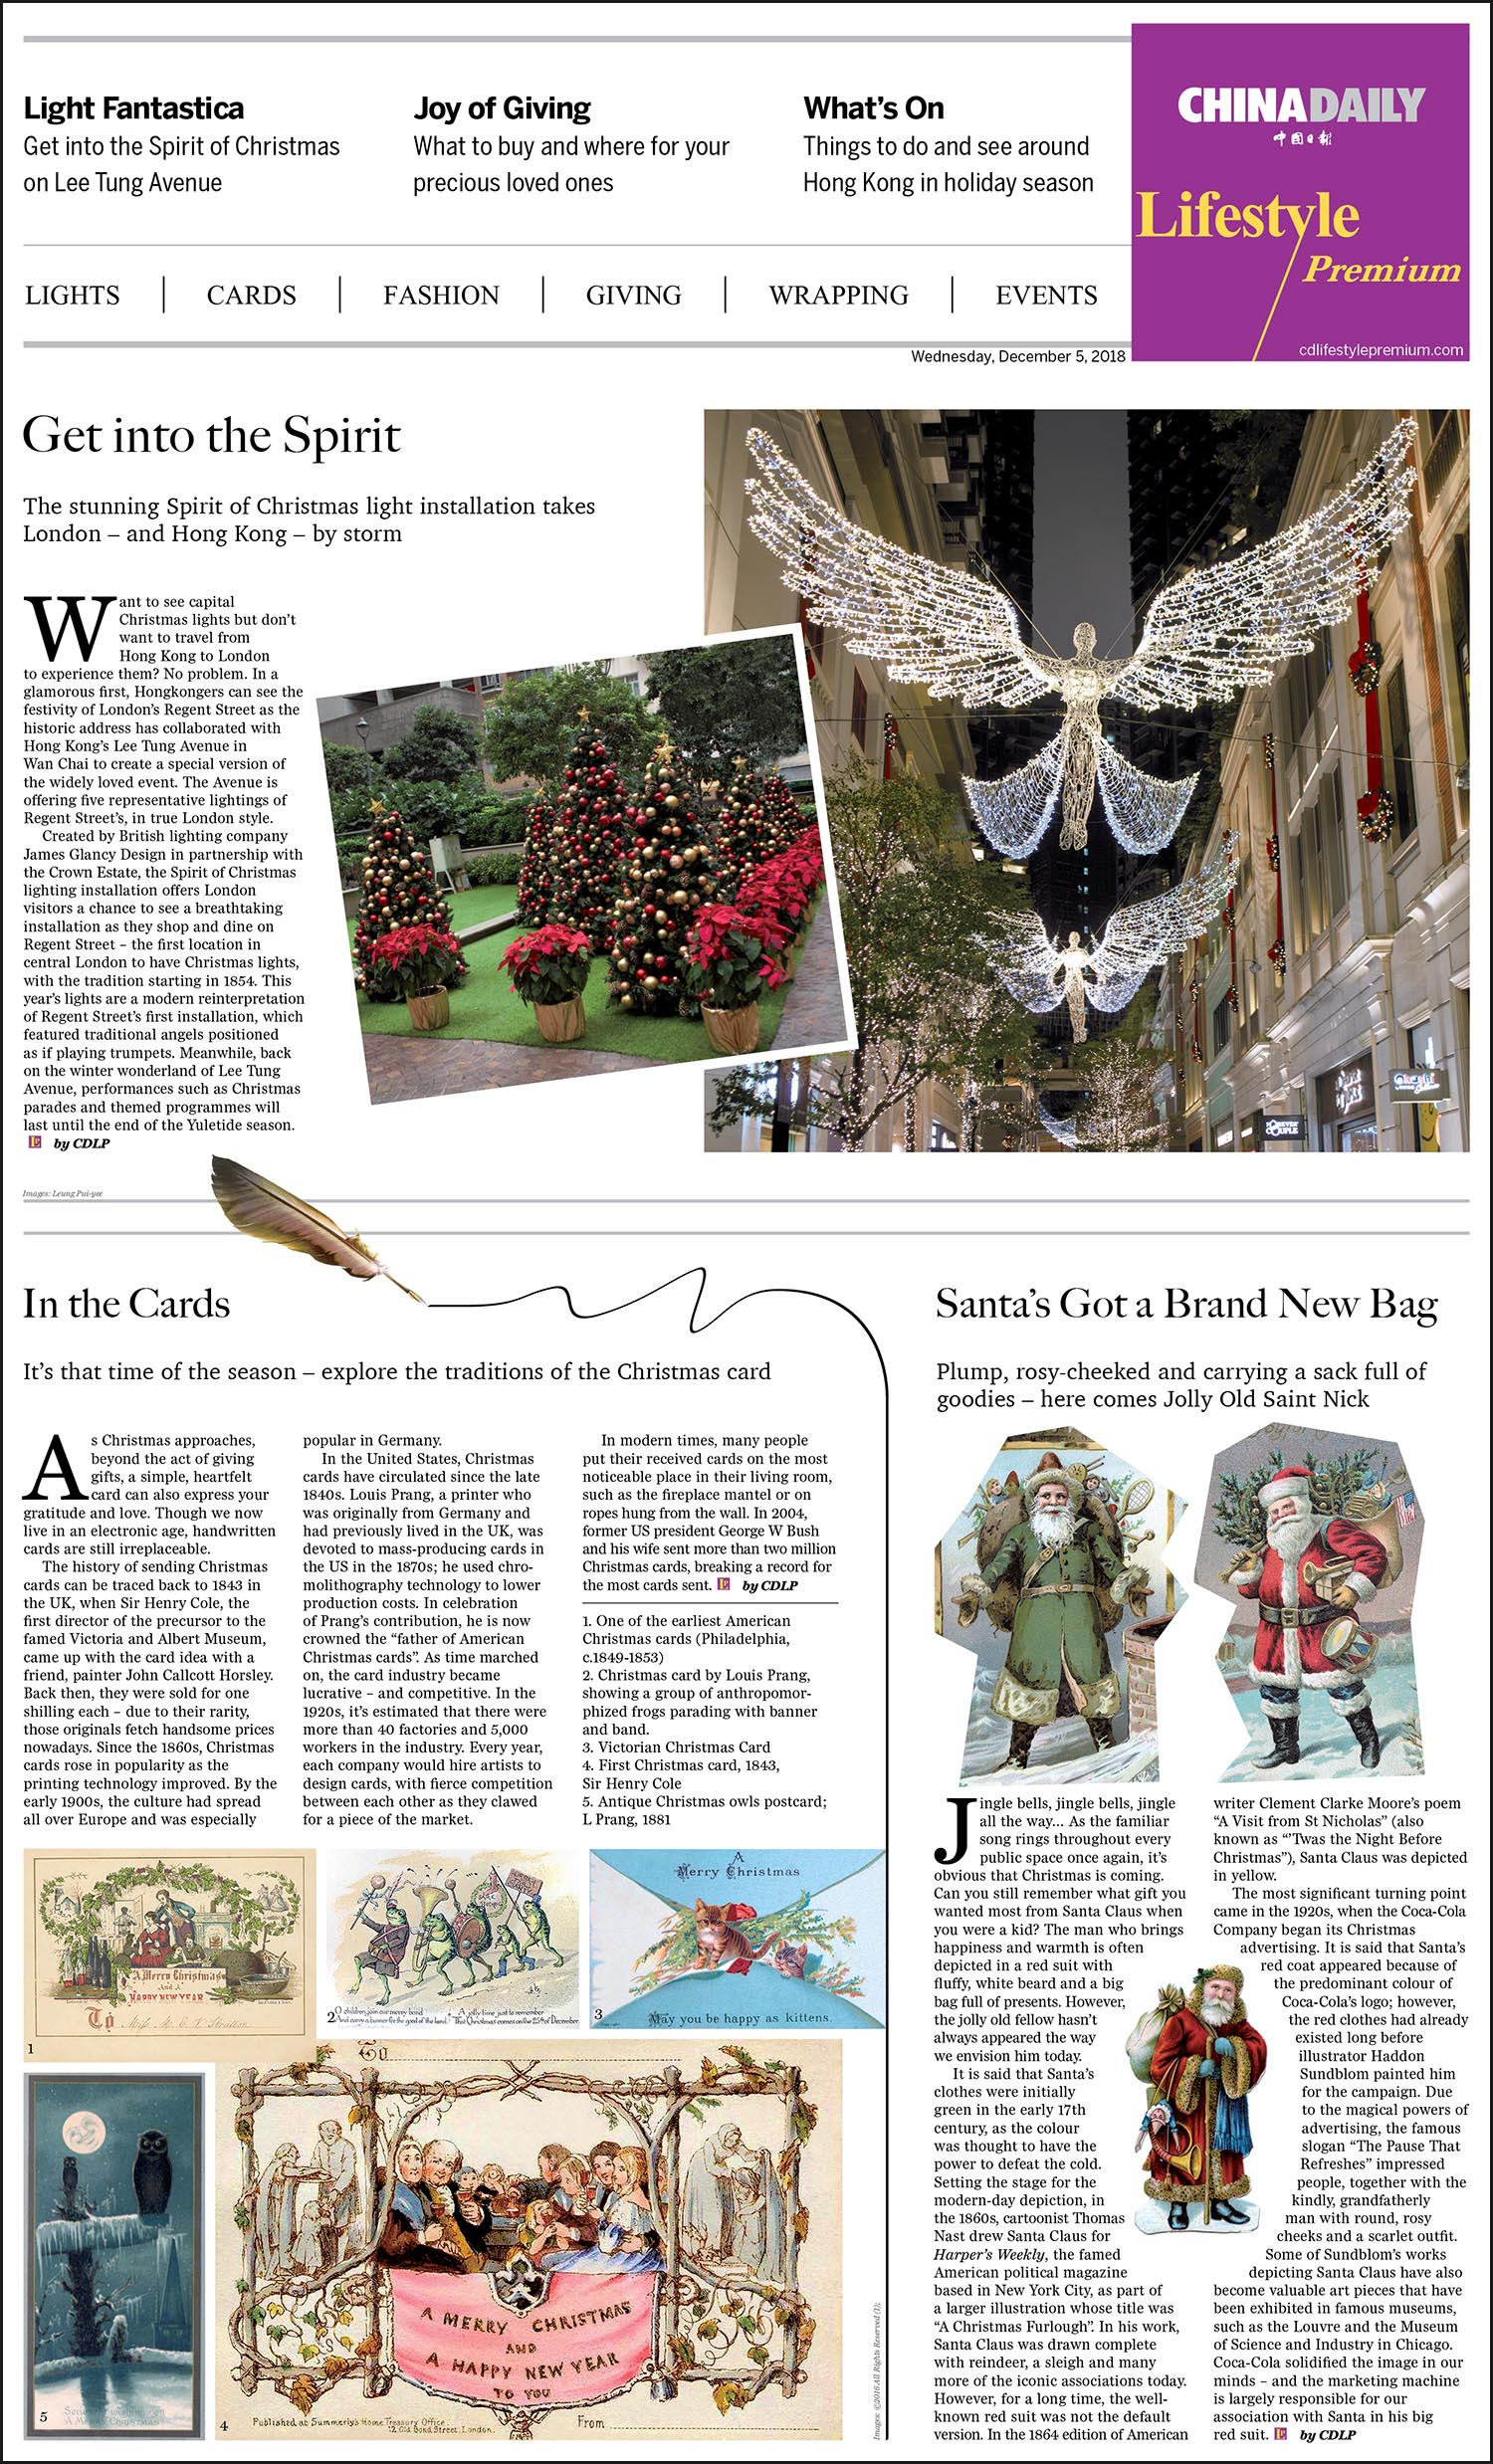 December 5 Issue